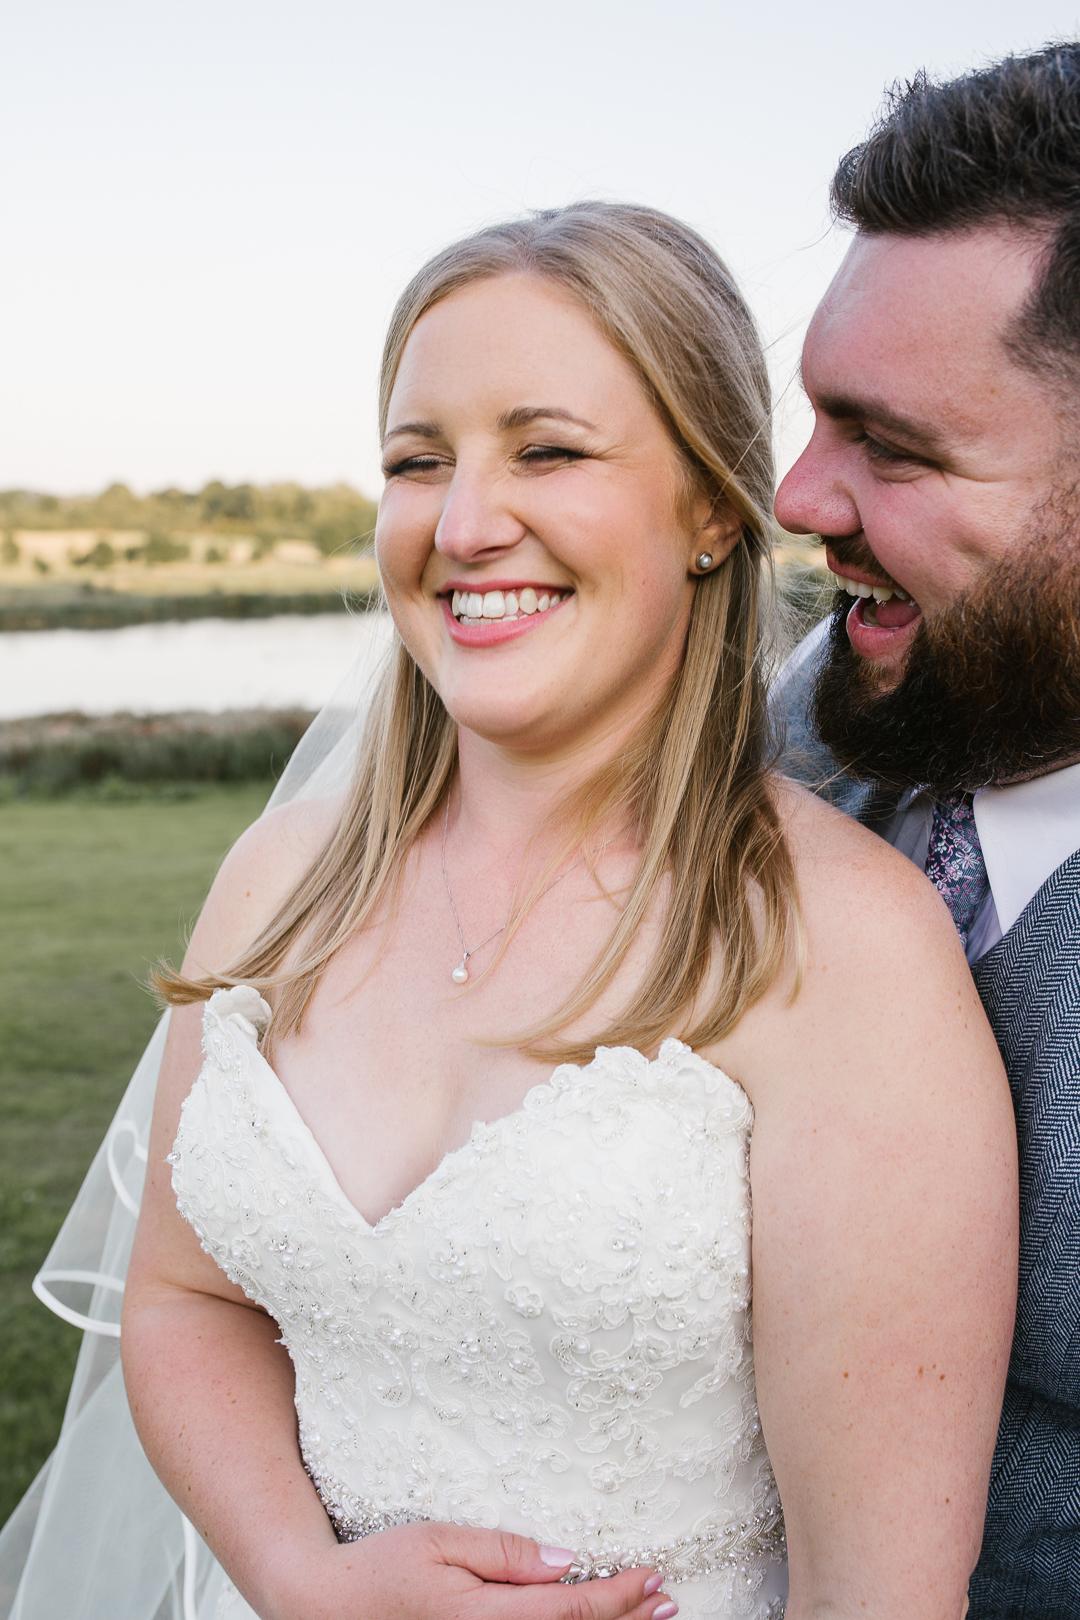 Ashes Barn, The Ashes Barn Wedding photographer, Staffordshire wedding photographer, danielle victoria photography -143.jpg